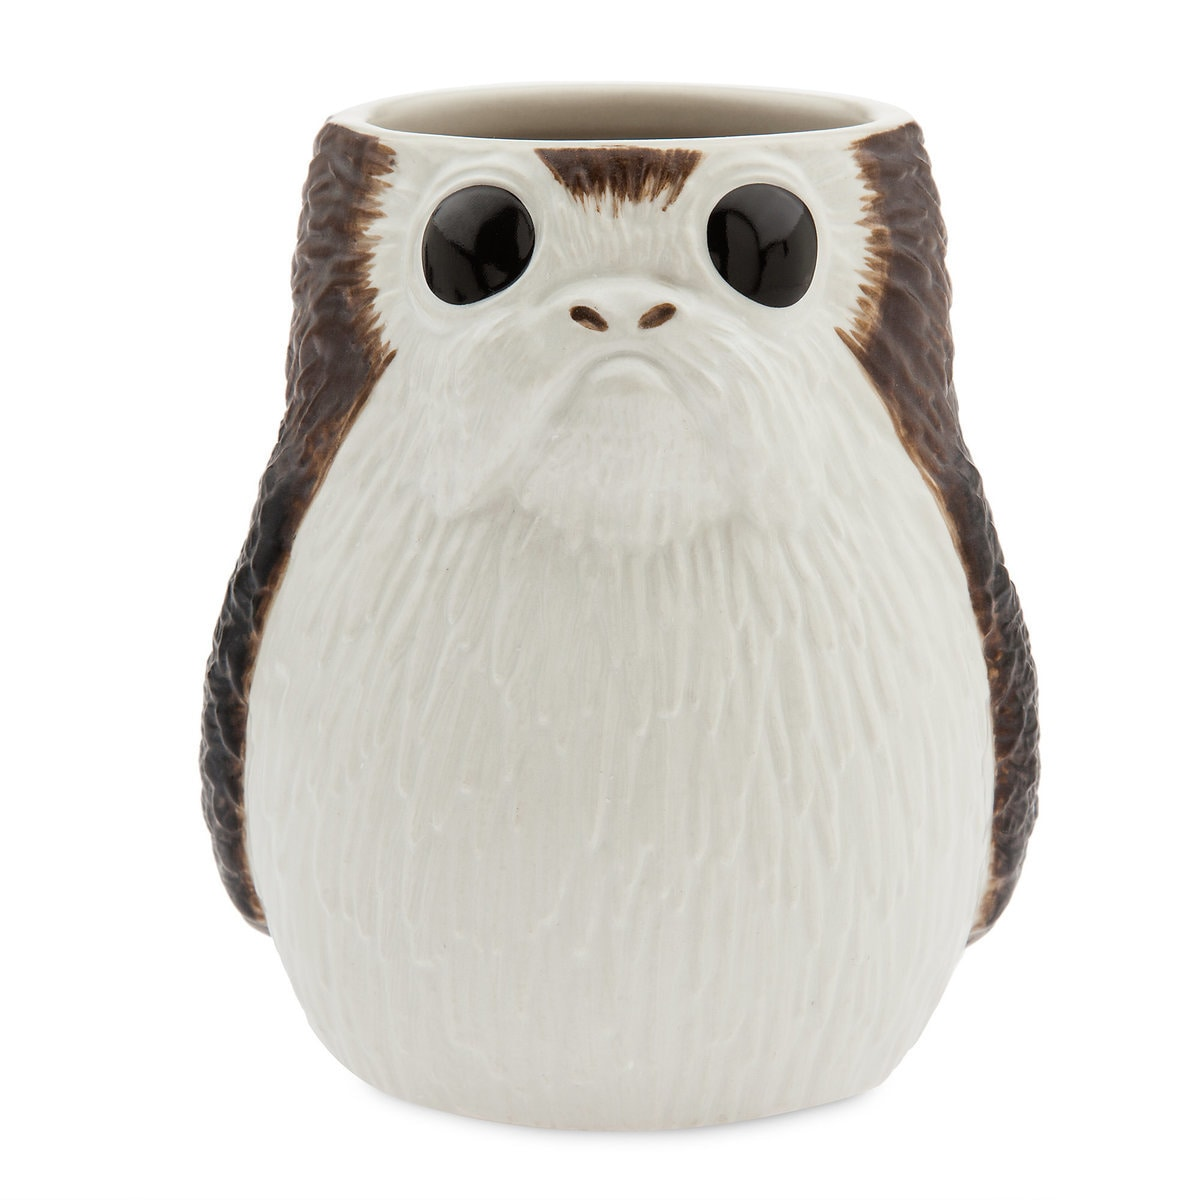 Star Wars: The Last Jedi 24-oz. Ceramic Porg Mug